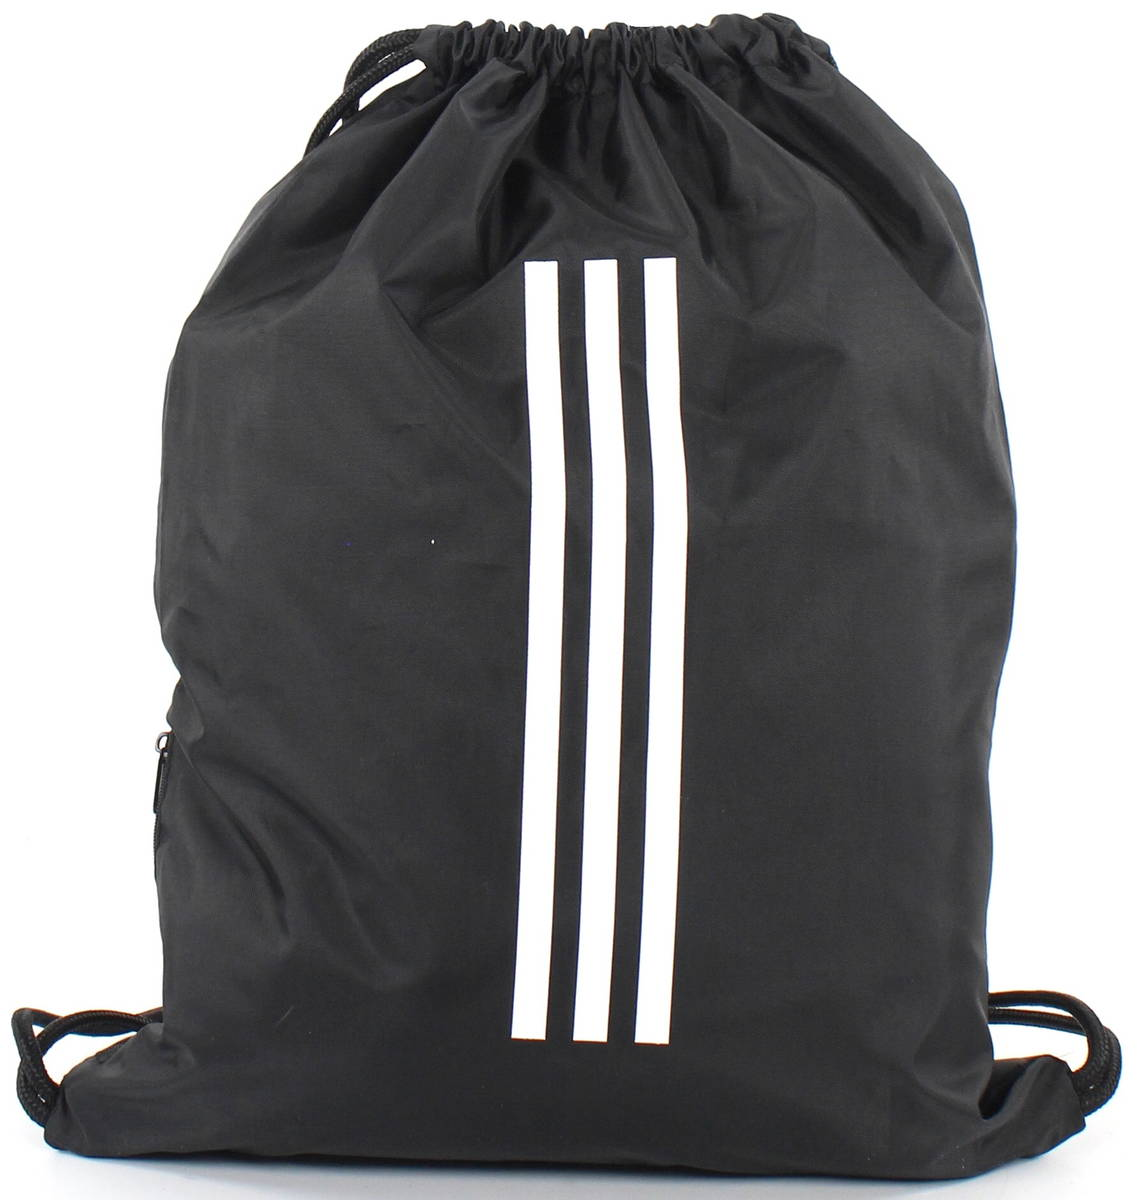 aa867ecf64 Adidas Gym Bag DQ1068, Black